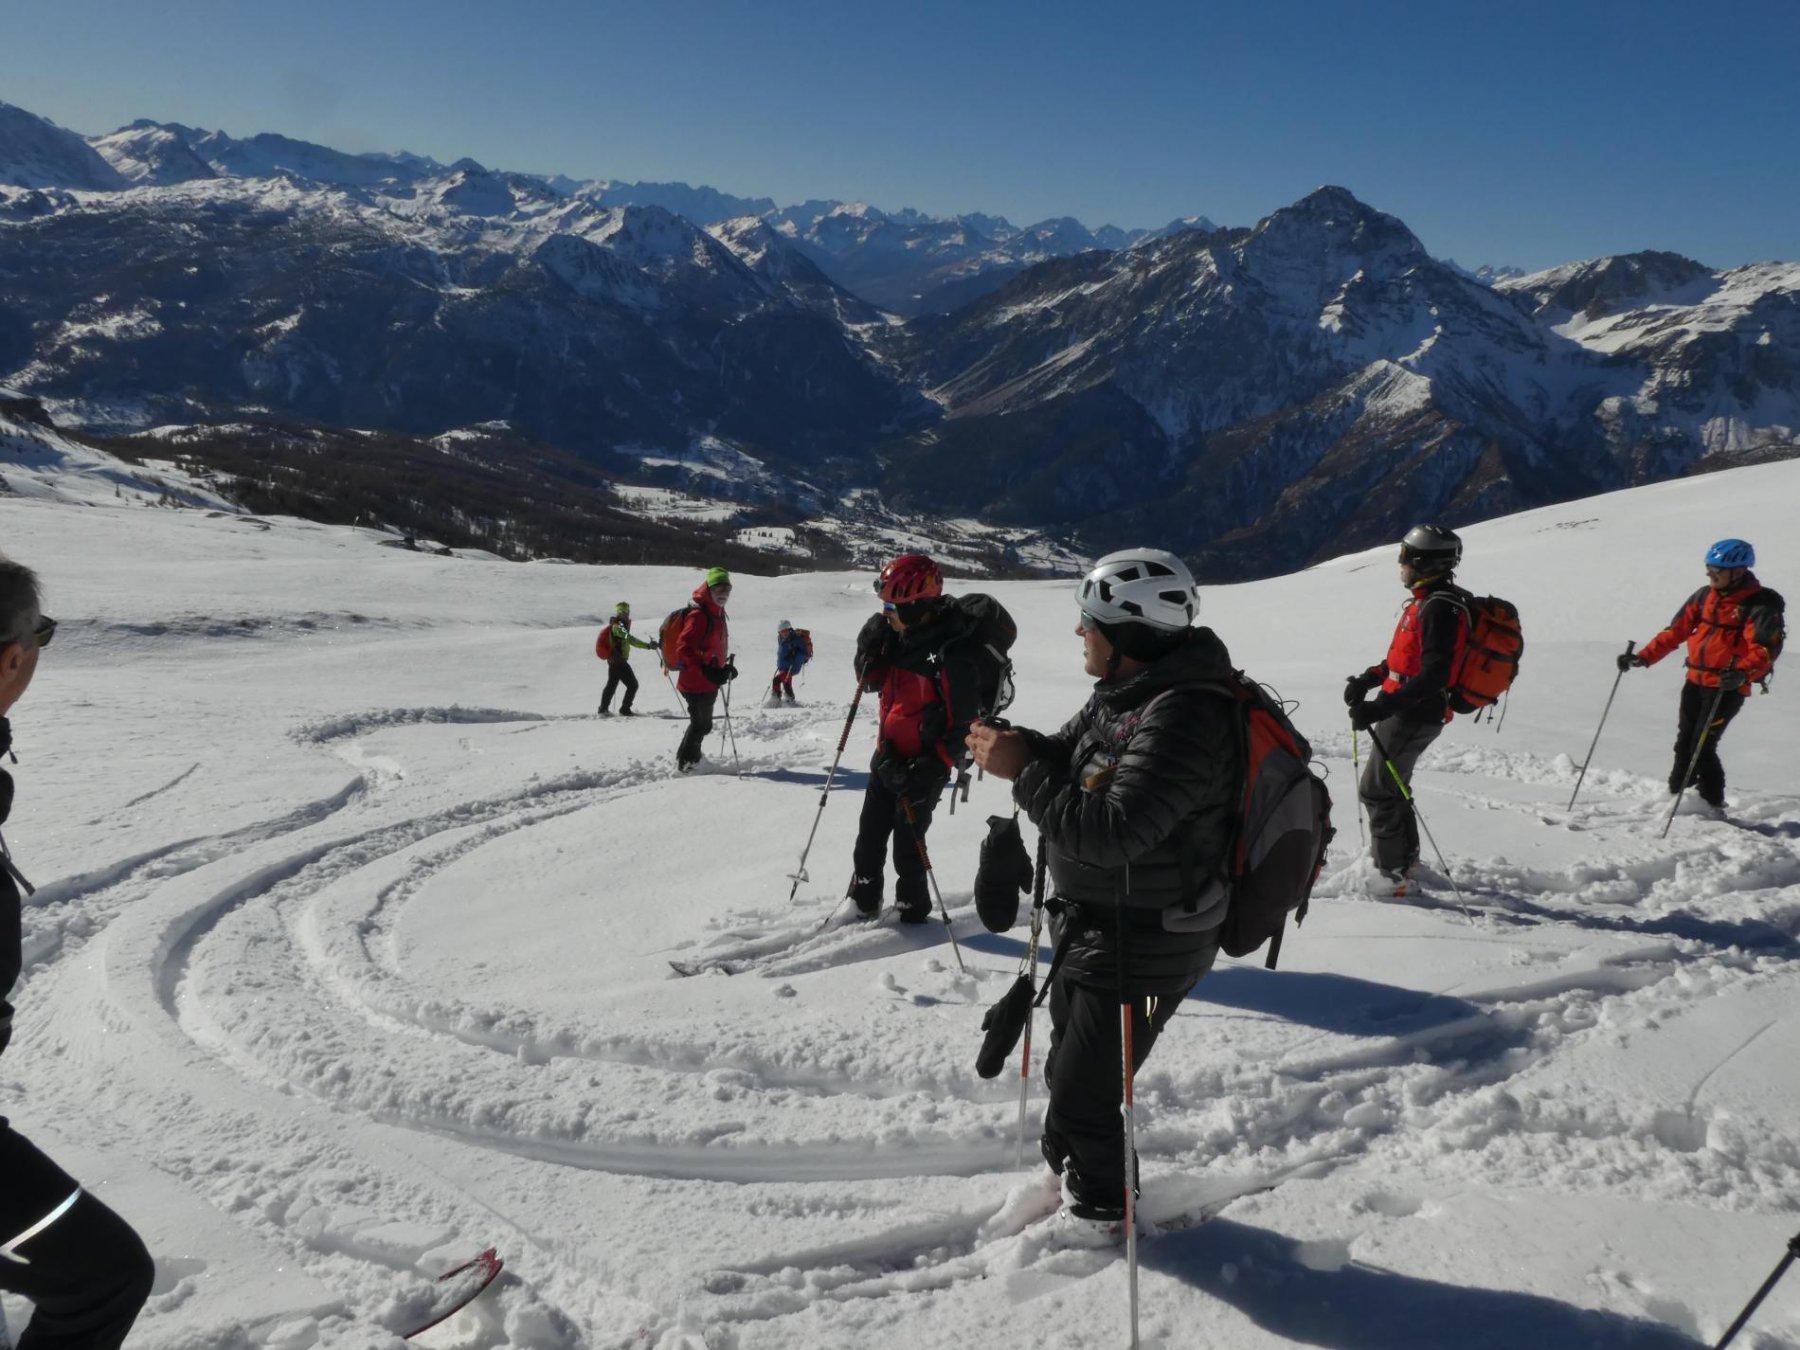 Fraiteve (Monte) da San Sicario 2017-12-06